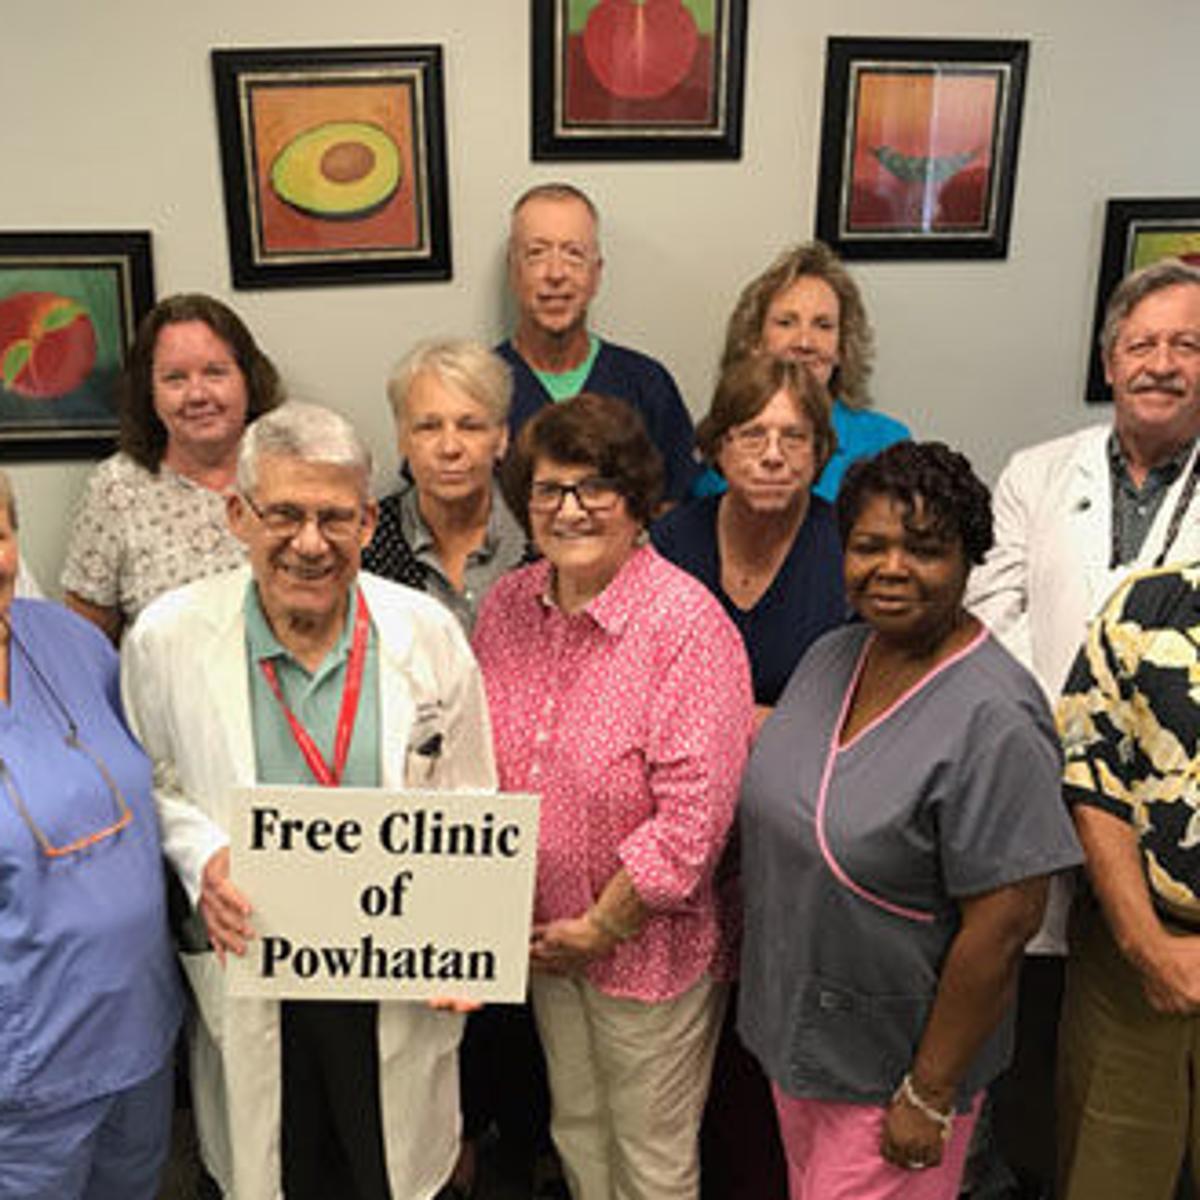 Free Clinic of Powhatan celebrates 10th anniversary | Powhatan Today